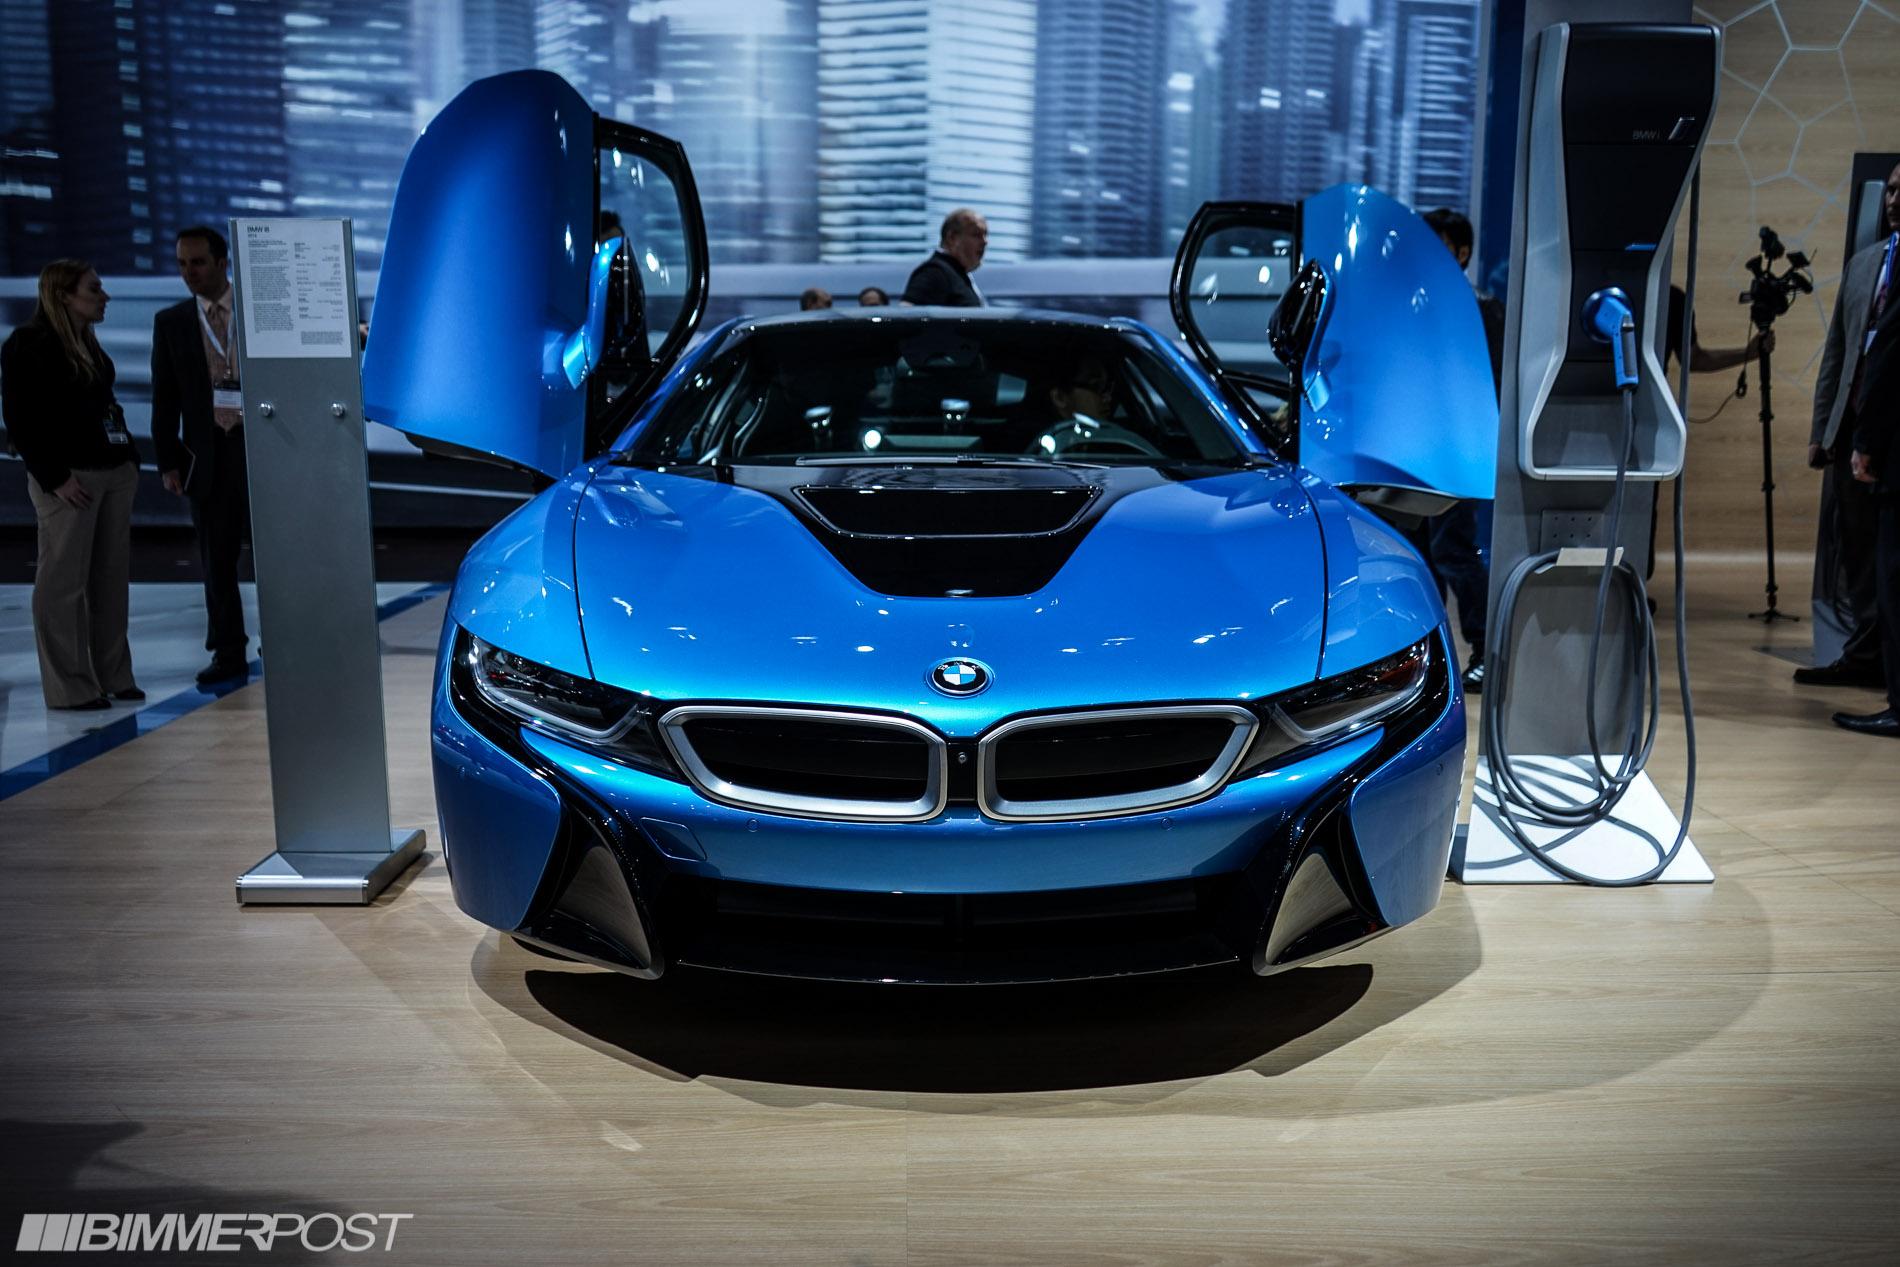 Bmw I8 Forum - BMW Forum, BMW News and BMW Blog - BIMMERPOST